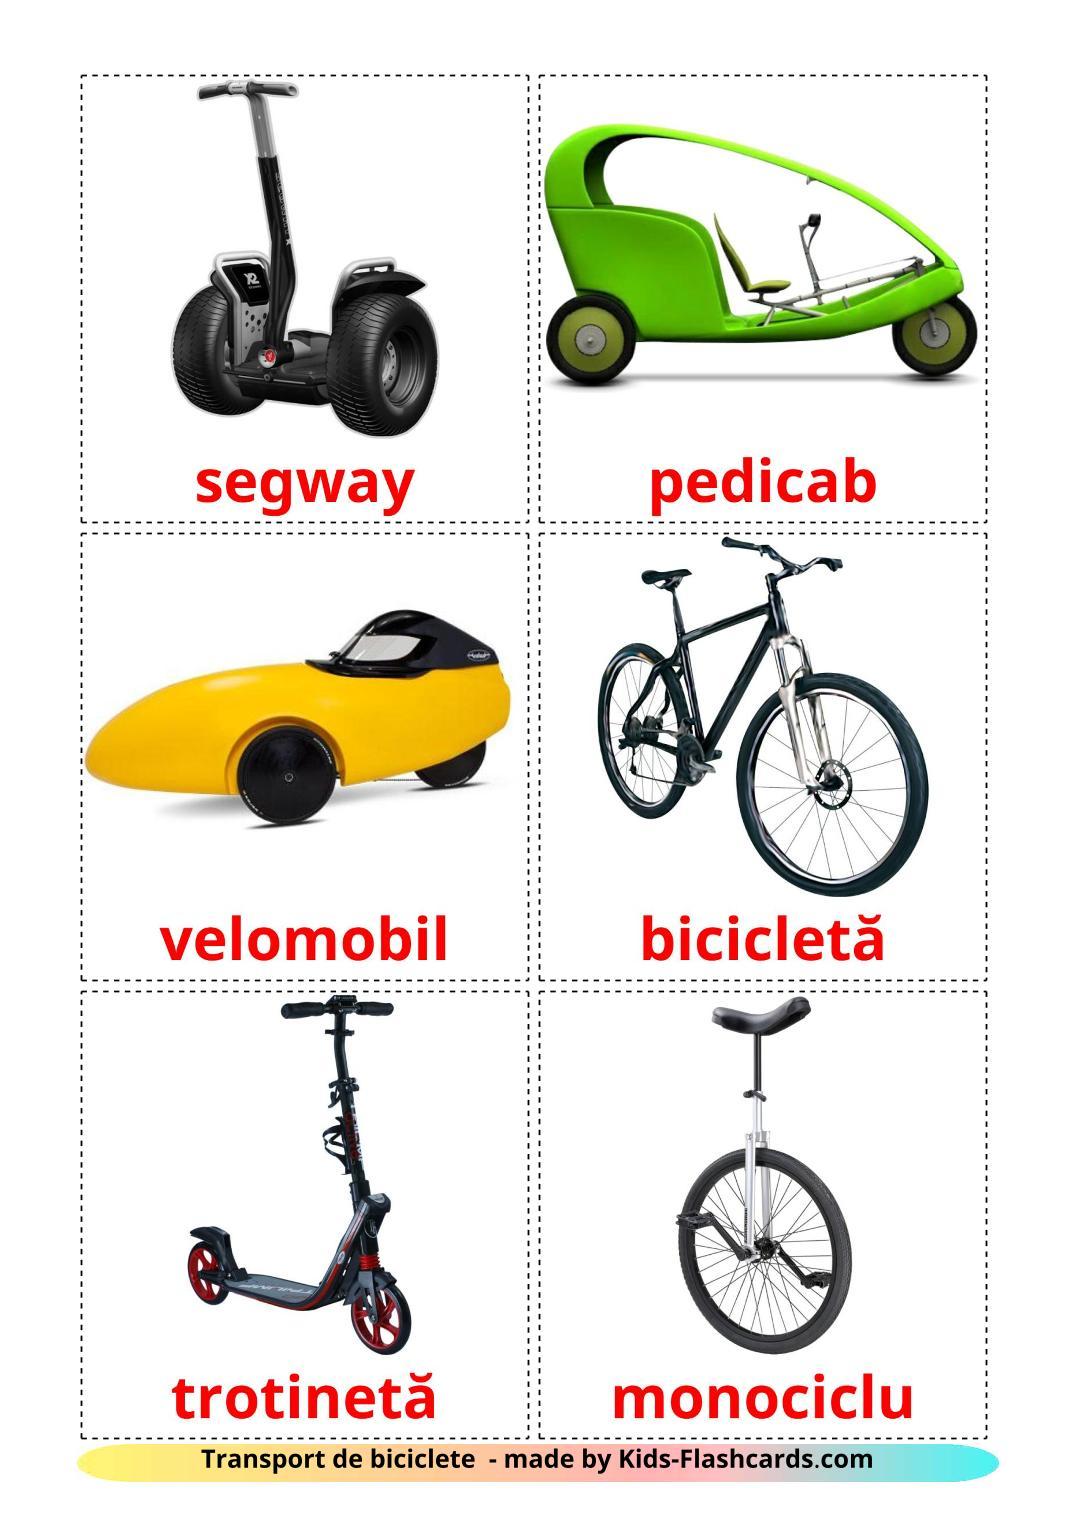 Bicycle transport - 16 Free Printable romanian Flashcards